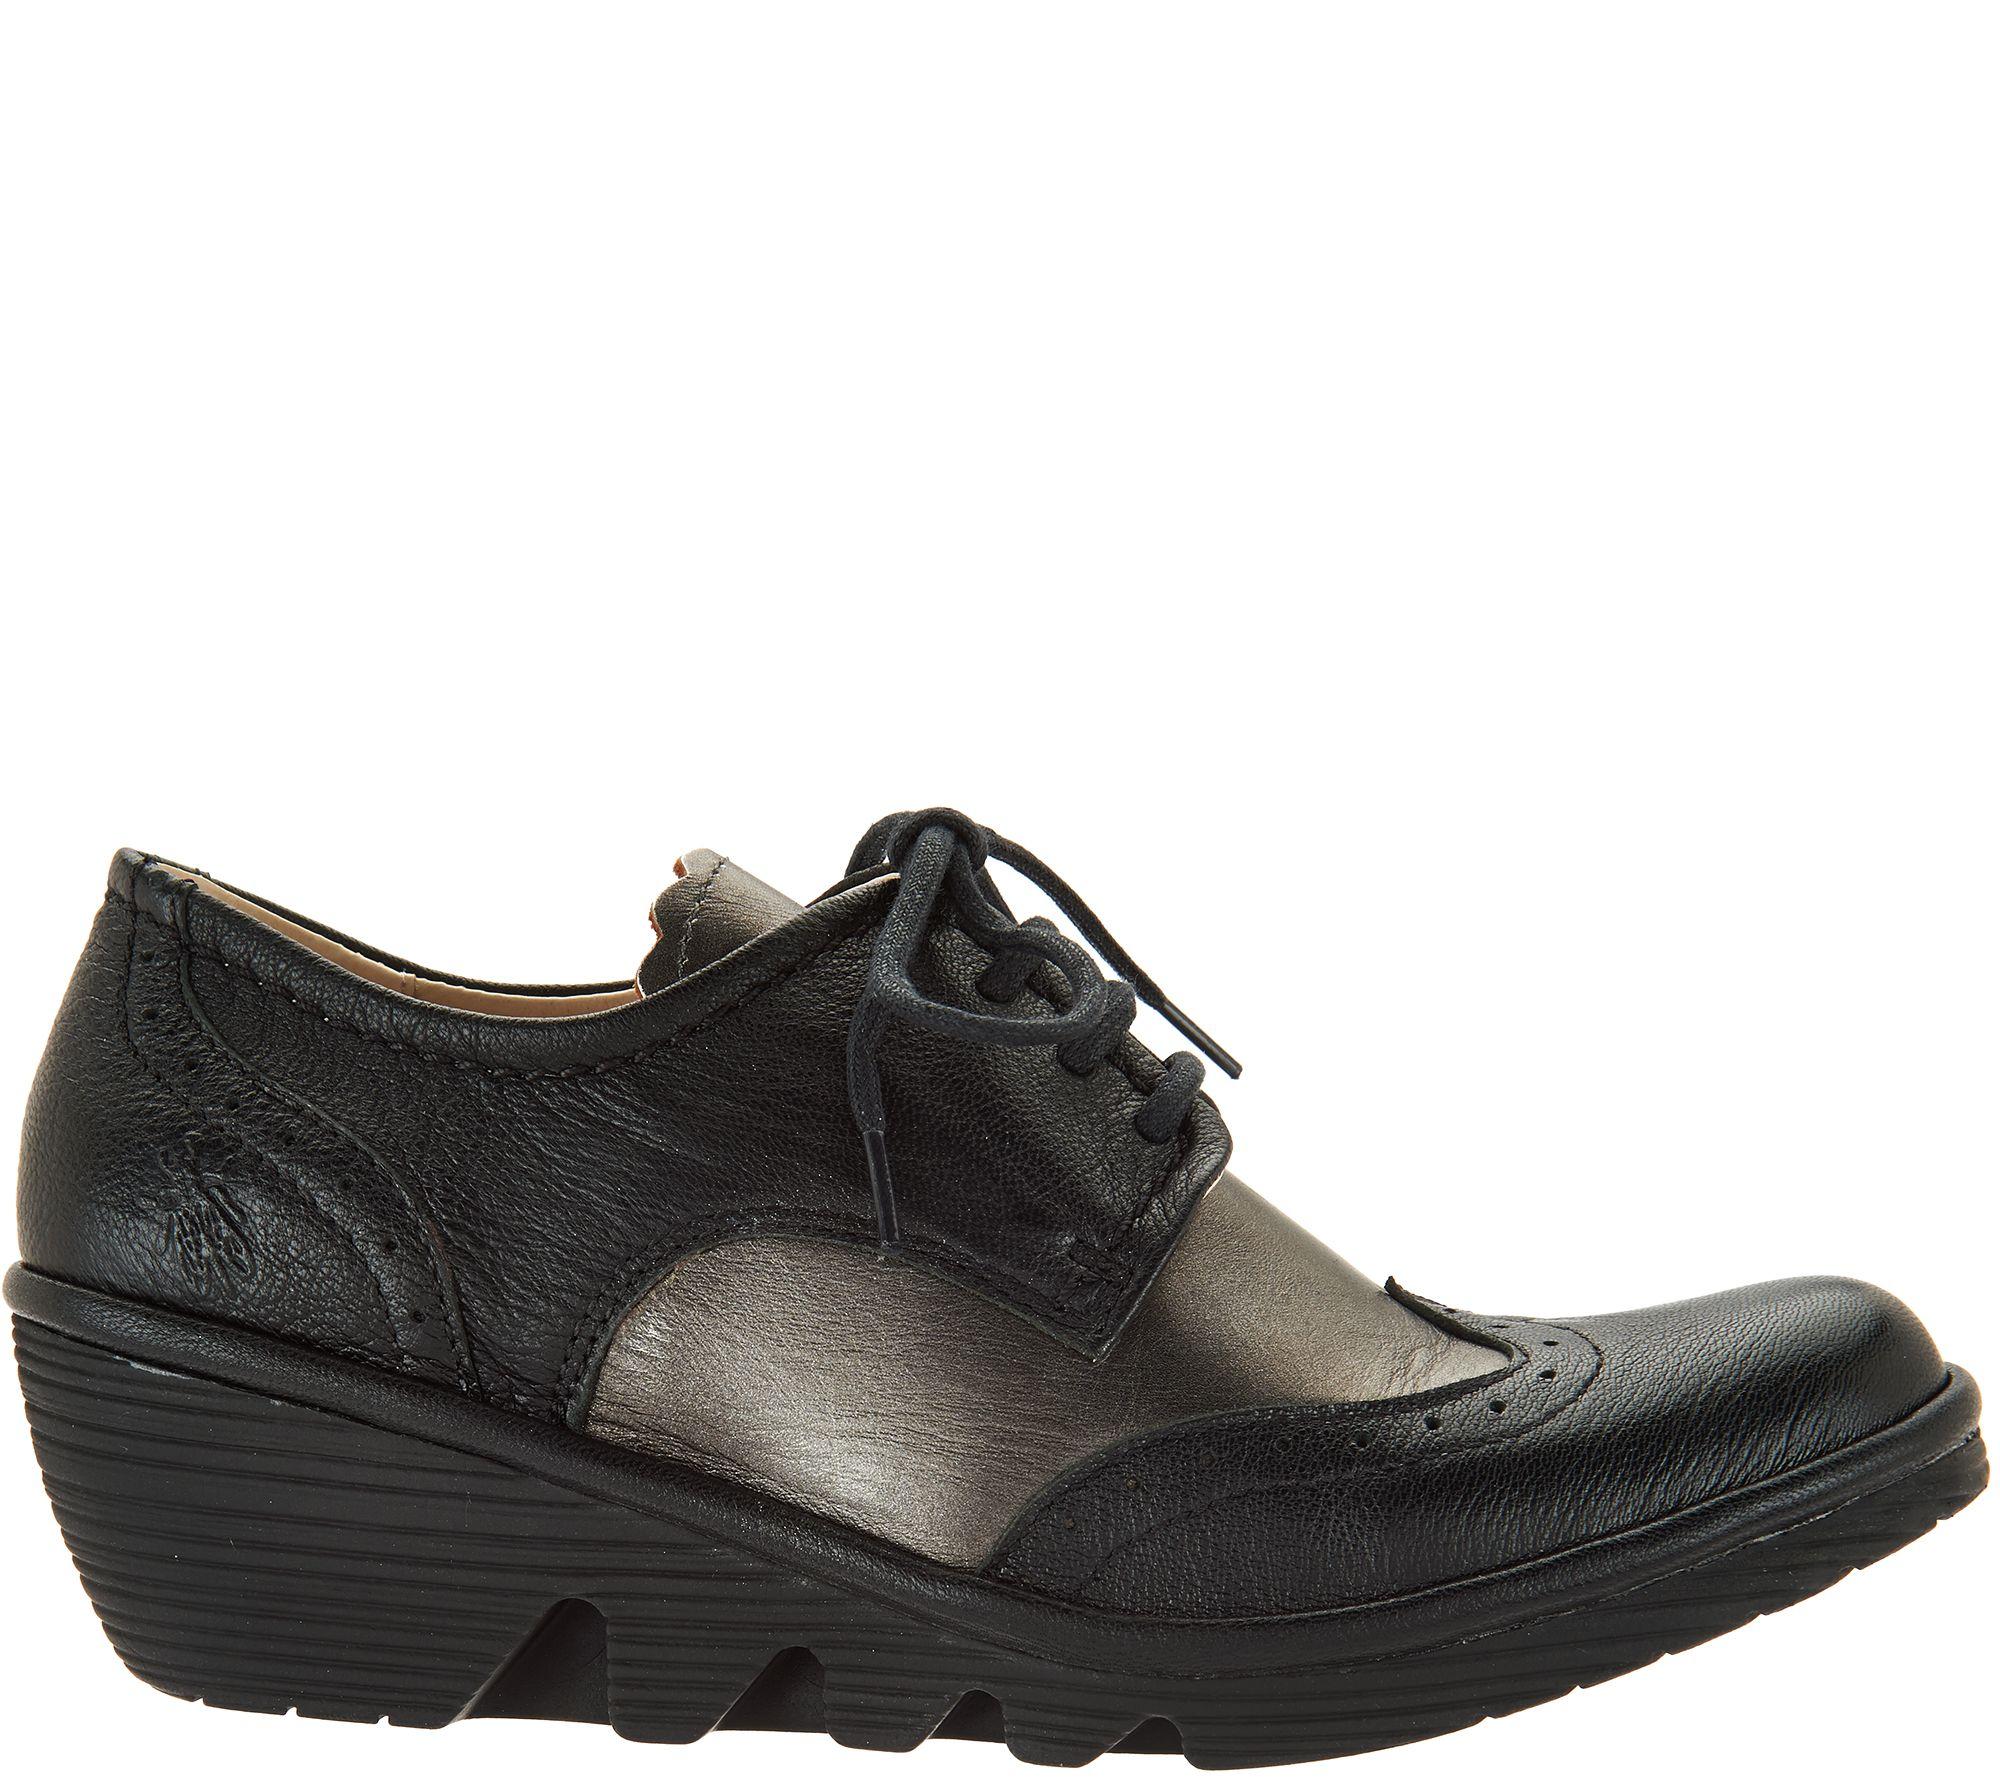 5d90ce7f580e FLY London Leather Wedge Lace-up Shoes - Palt - Page 1 — QVC.com